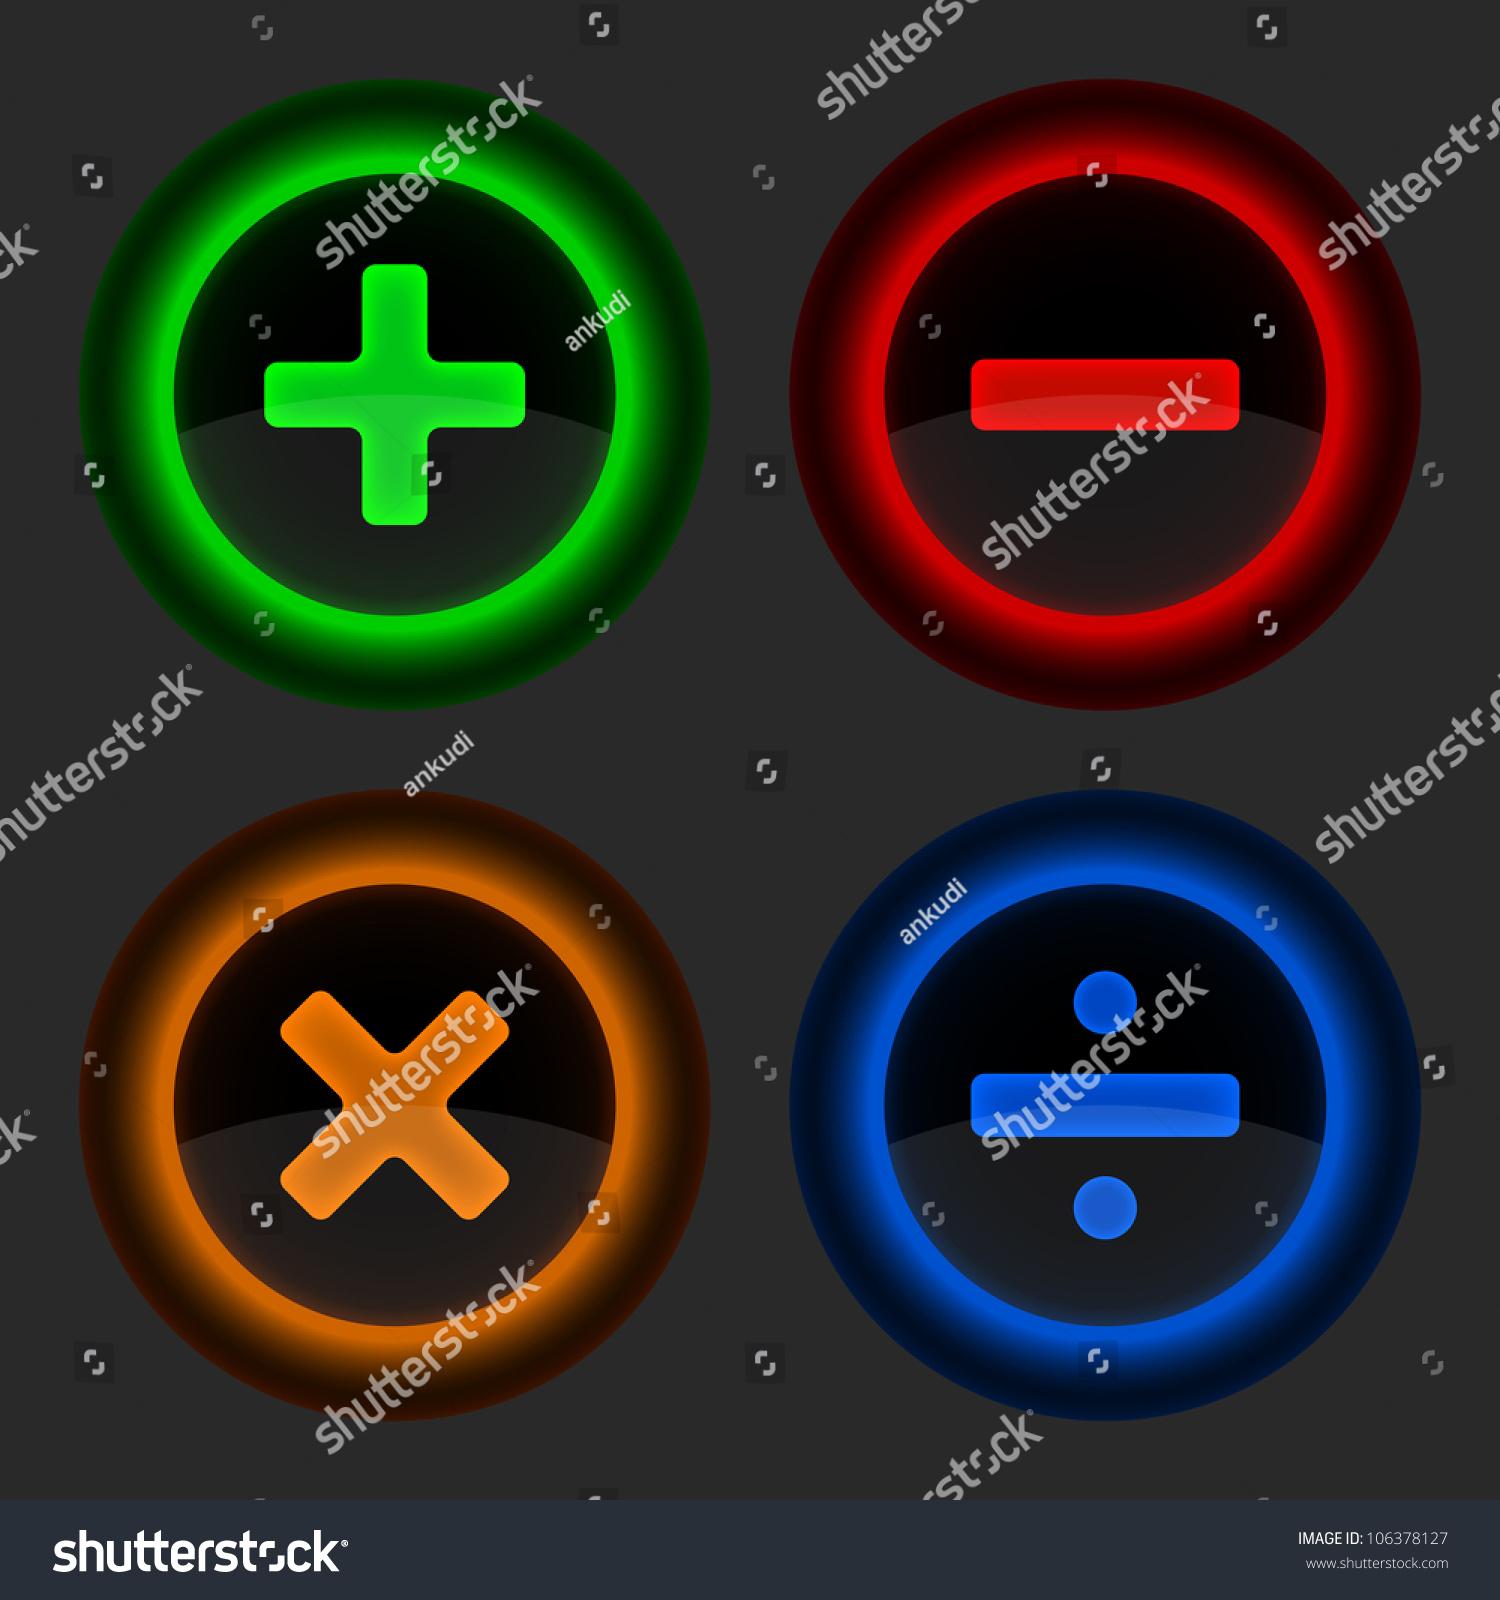 Colored web button math symbols round stock vector 106378127 colored web button with math symbols round shapes gray background vector illustration 10 biocorpaavc